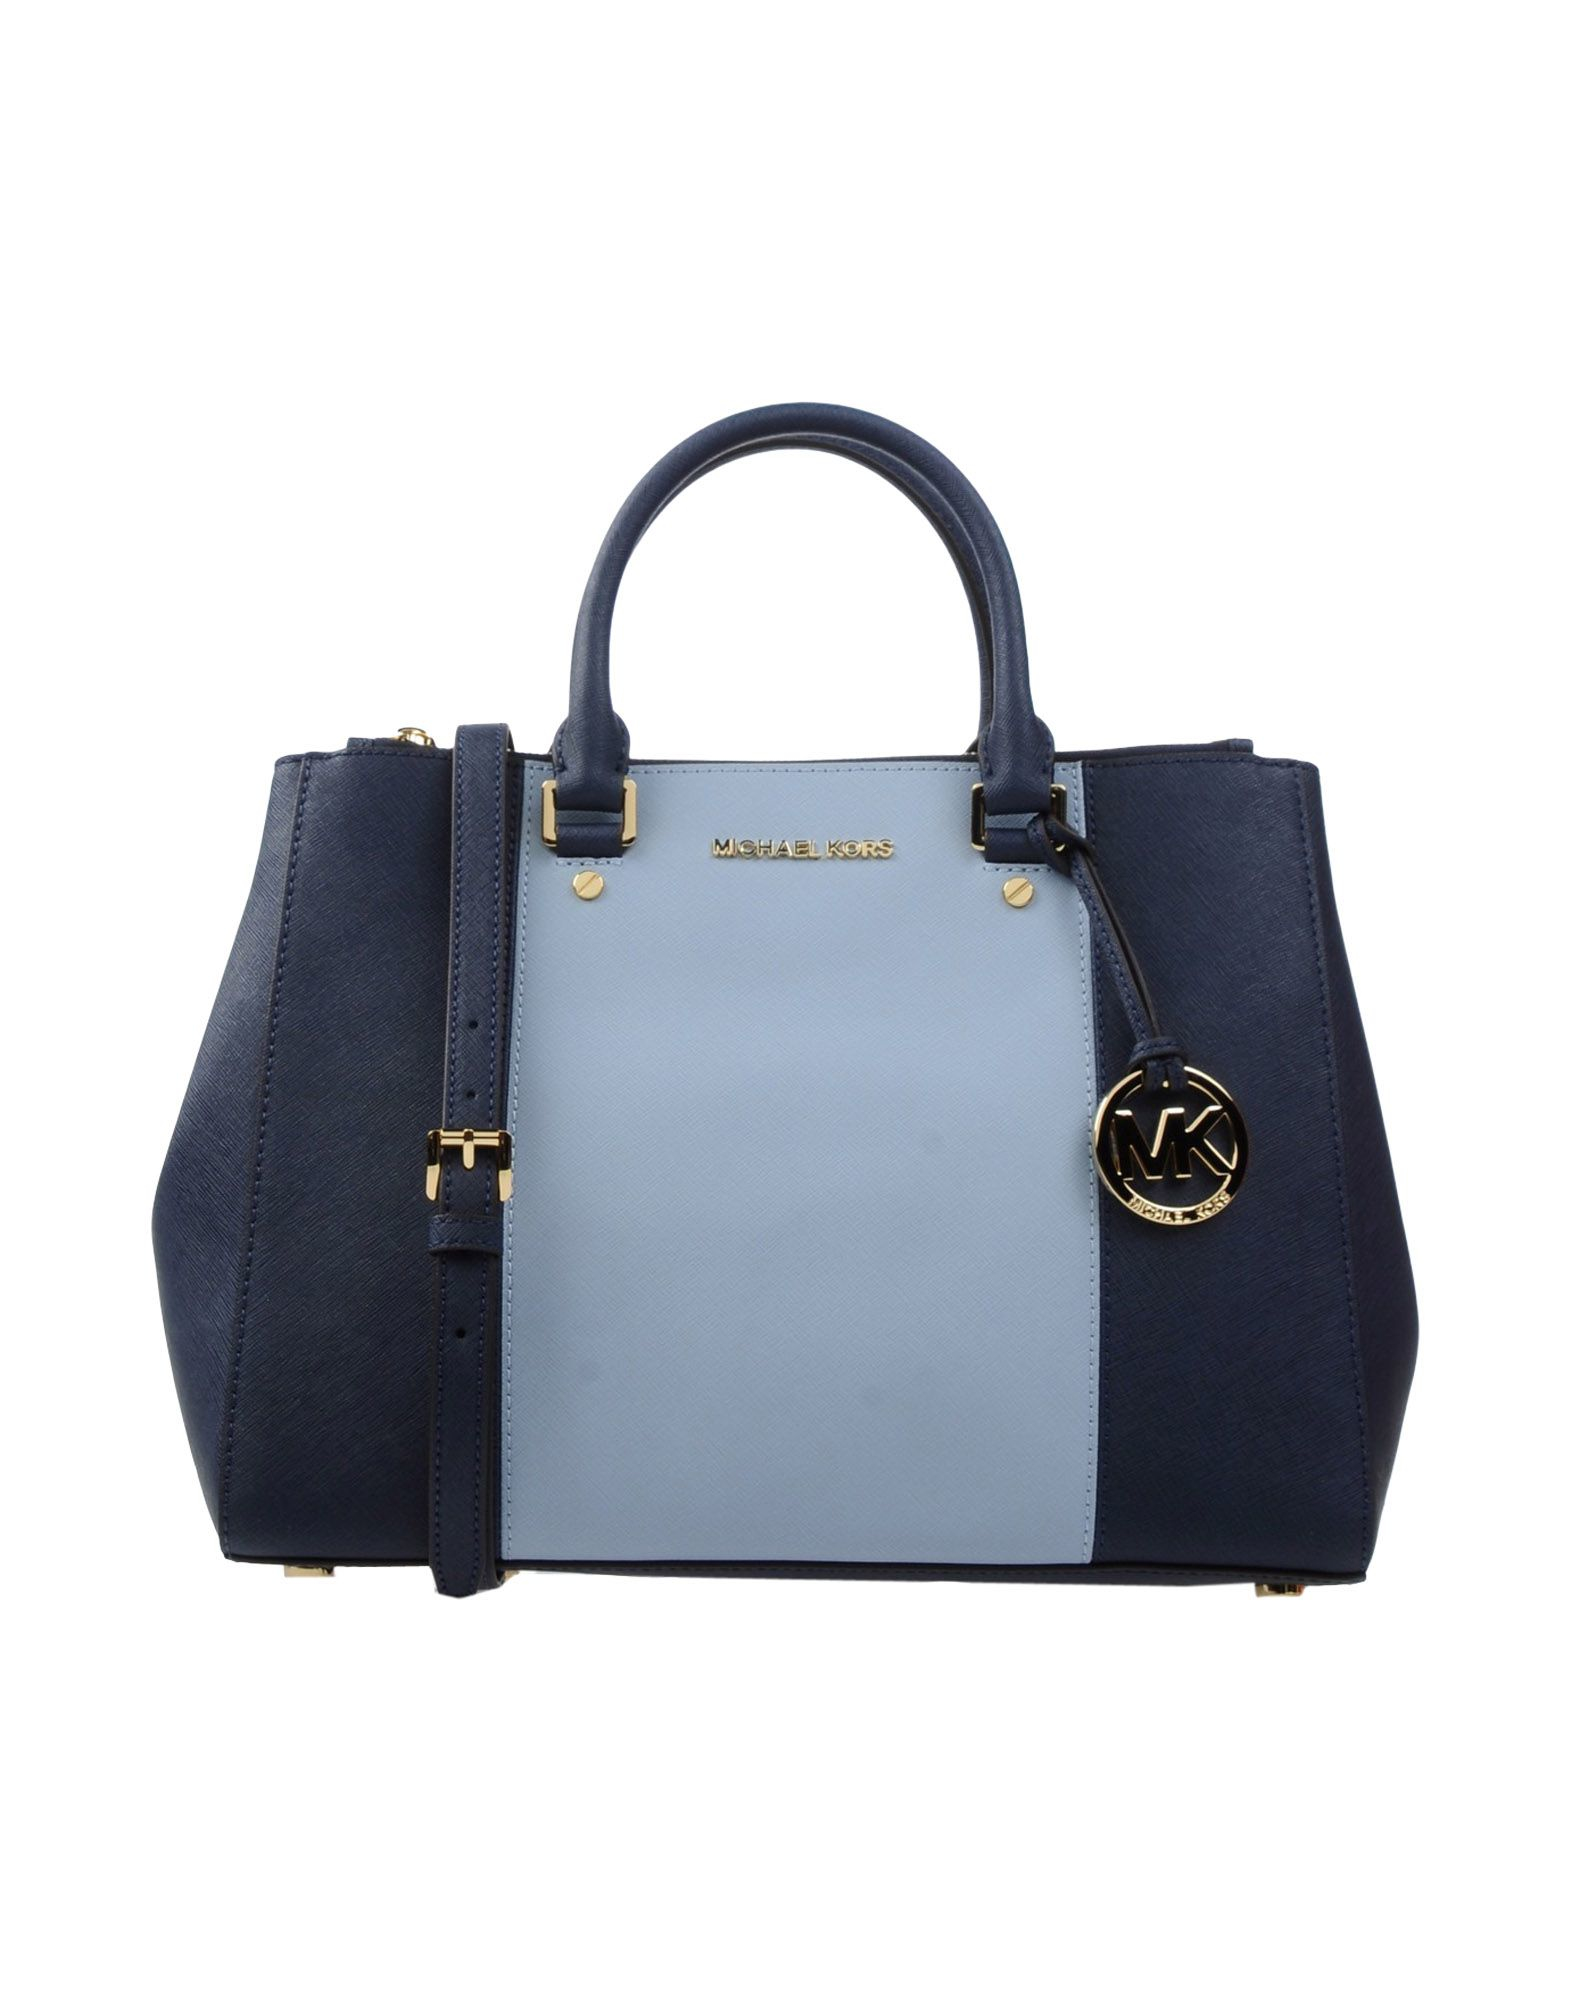 4c26e3bf169a Lyst - MICHAEL Michael Kors Handbag in Blue